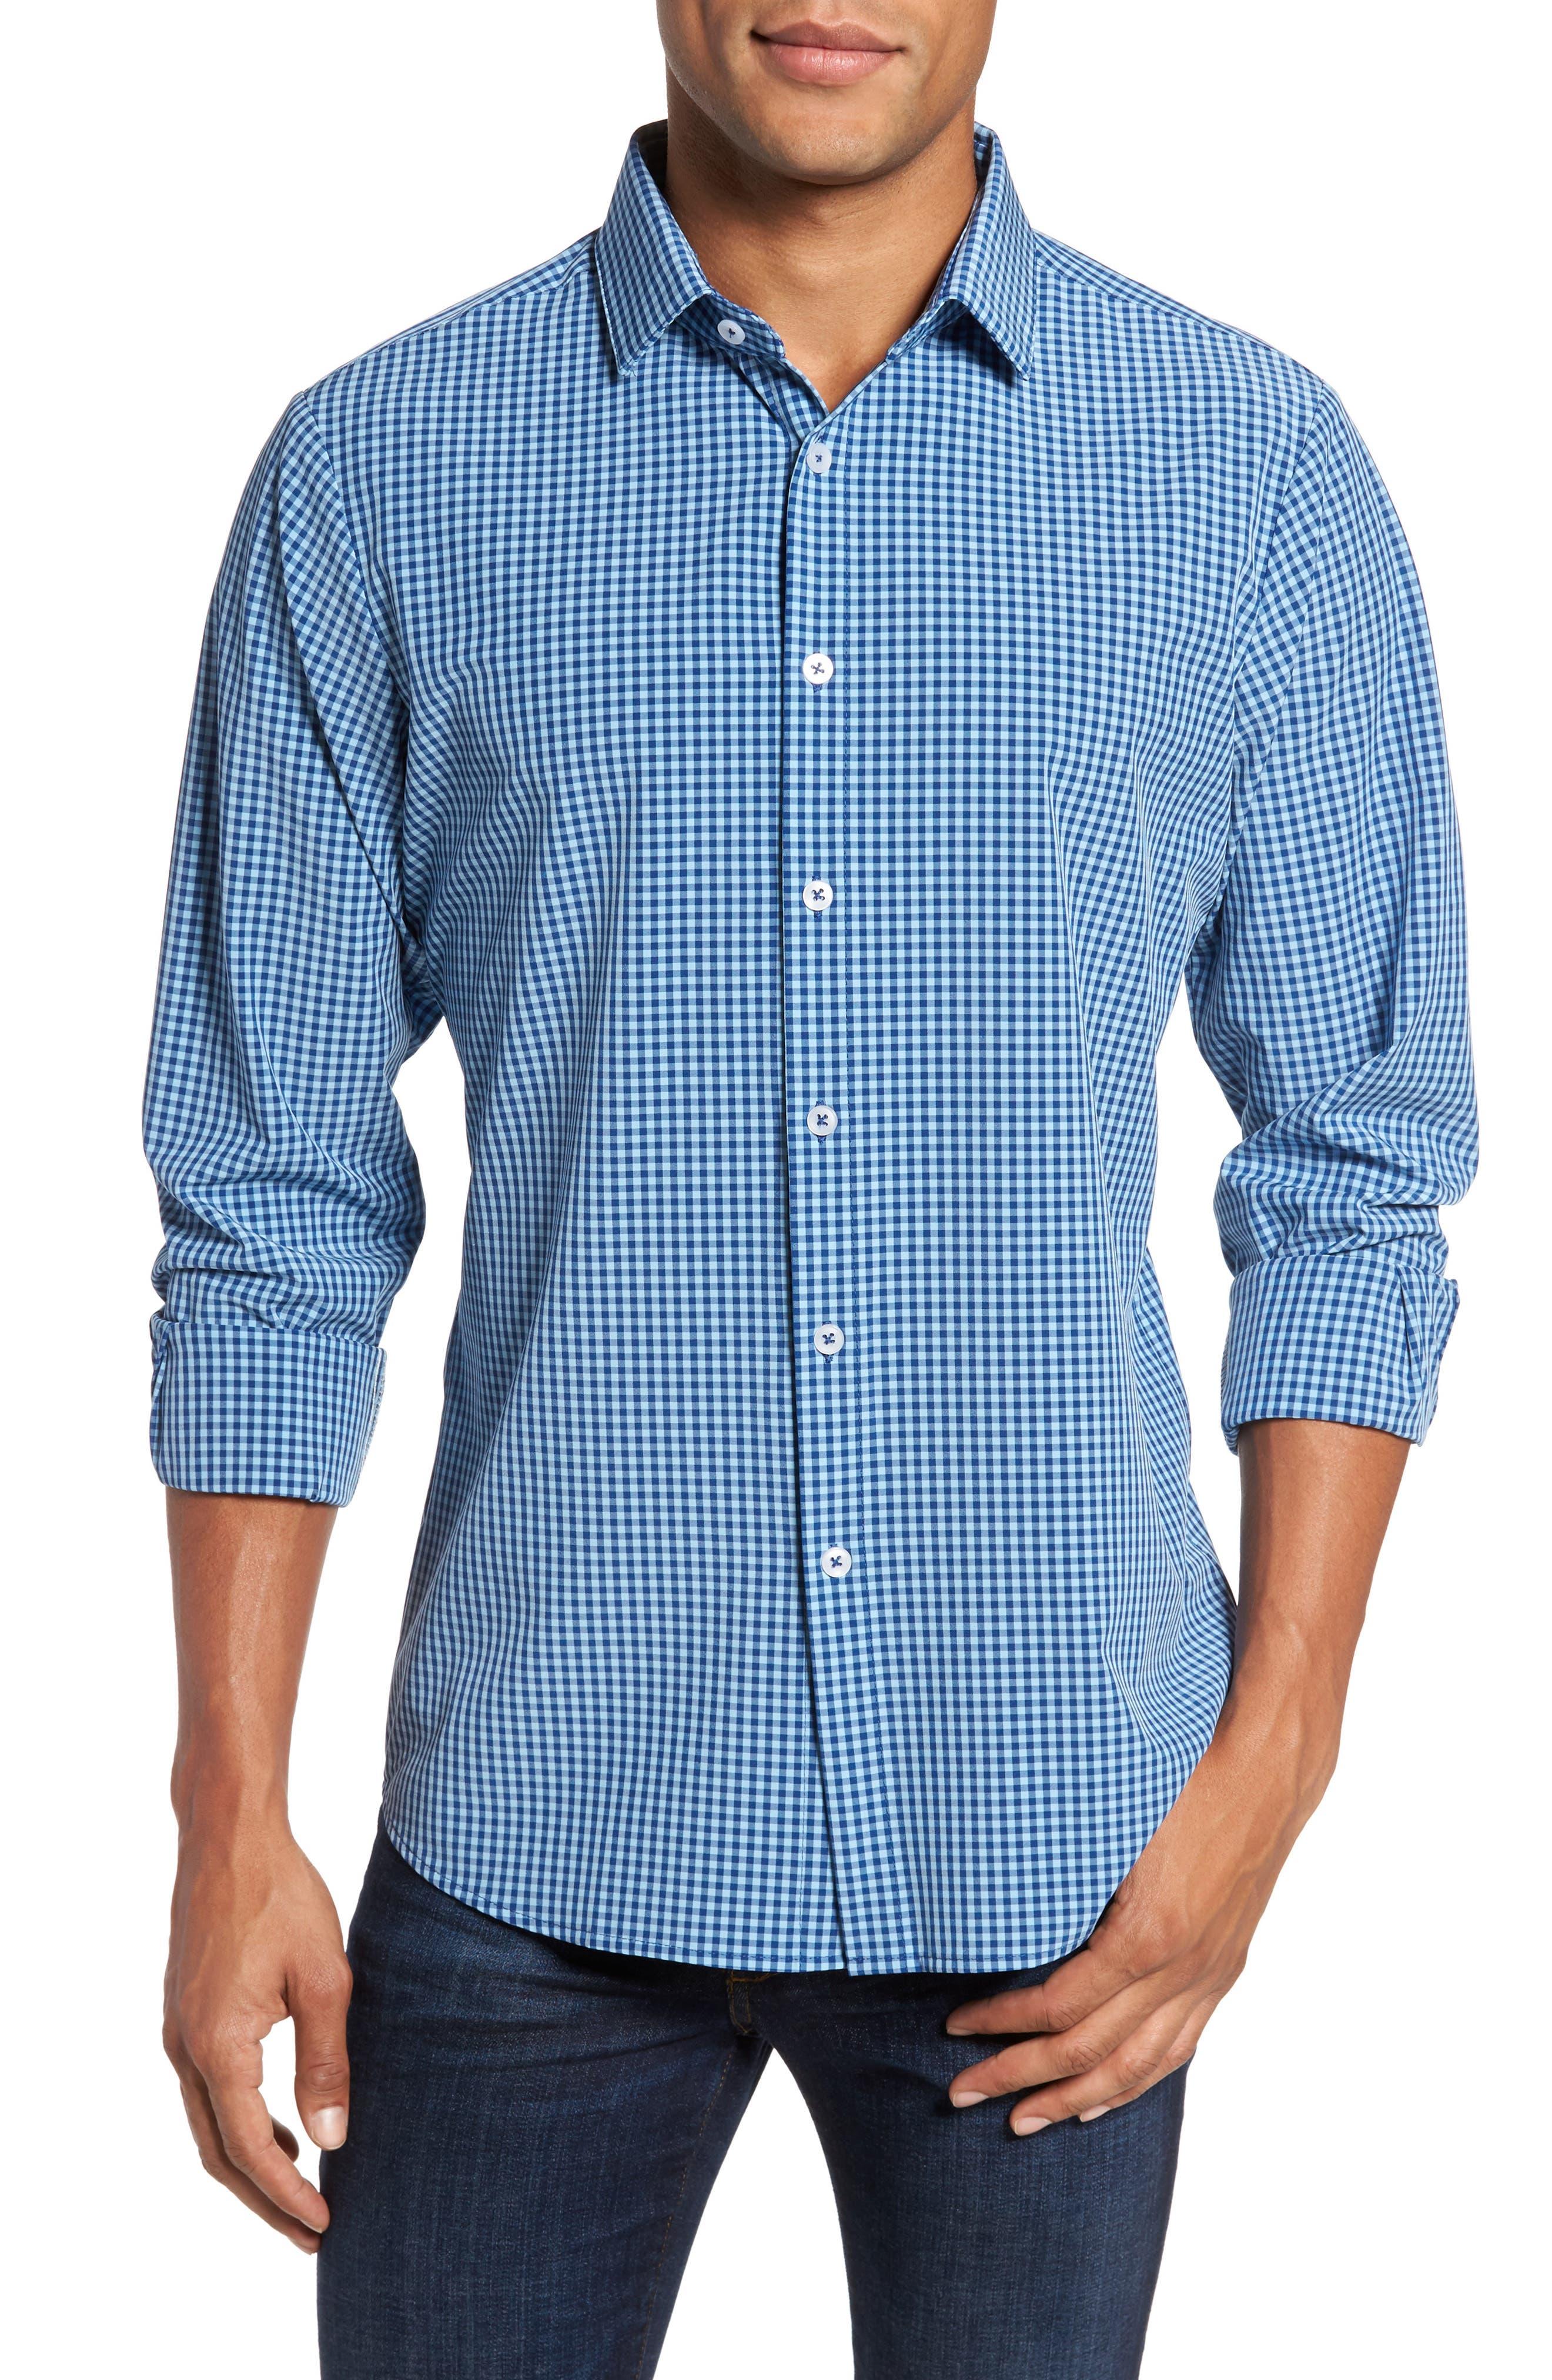 Brighton Blue Check Sport Shirt,                             Main thumbnail 1, color,                             Blue